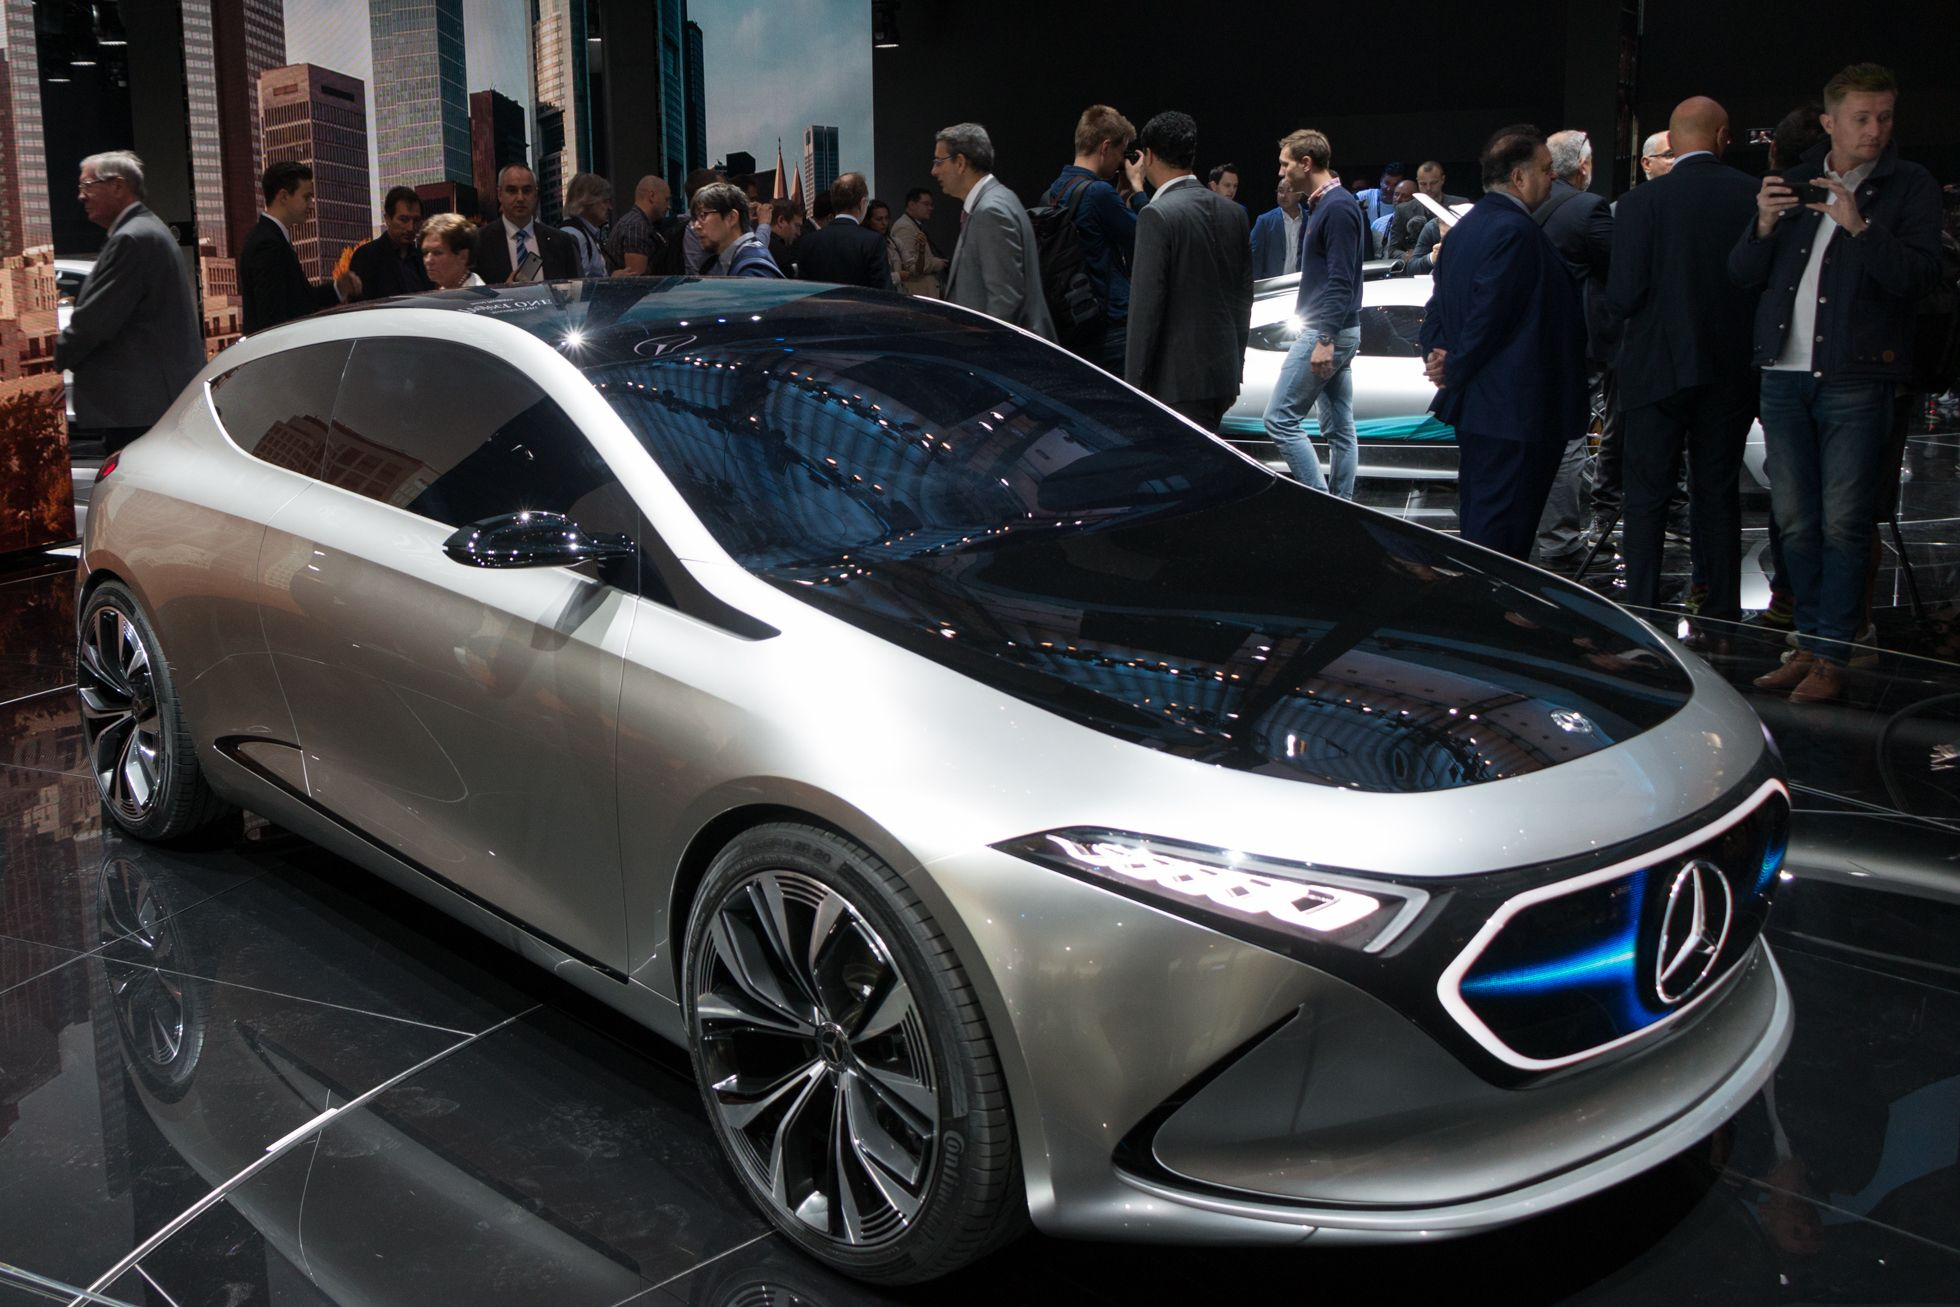 Concept EQA: Mercedes elektrifiziert die Kompaktklasse - Concept EQA af der IAA 2017: So soll Daimlers elektrische Kompaktklasse in Zukunft aussehen. (Foto: Werner Pluta/Golem.de)